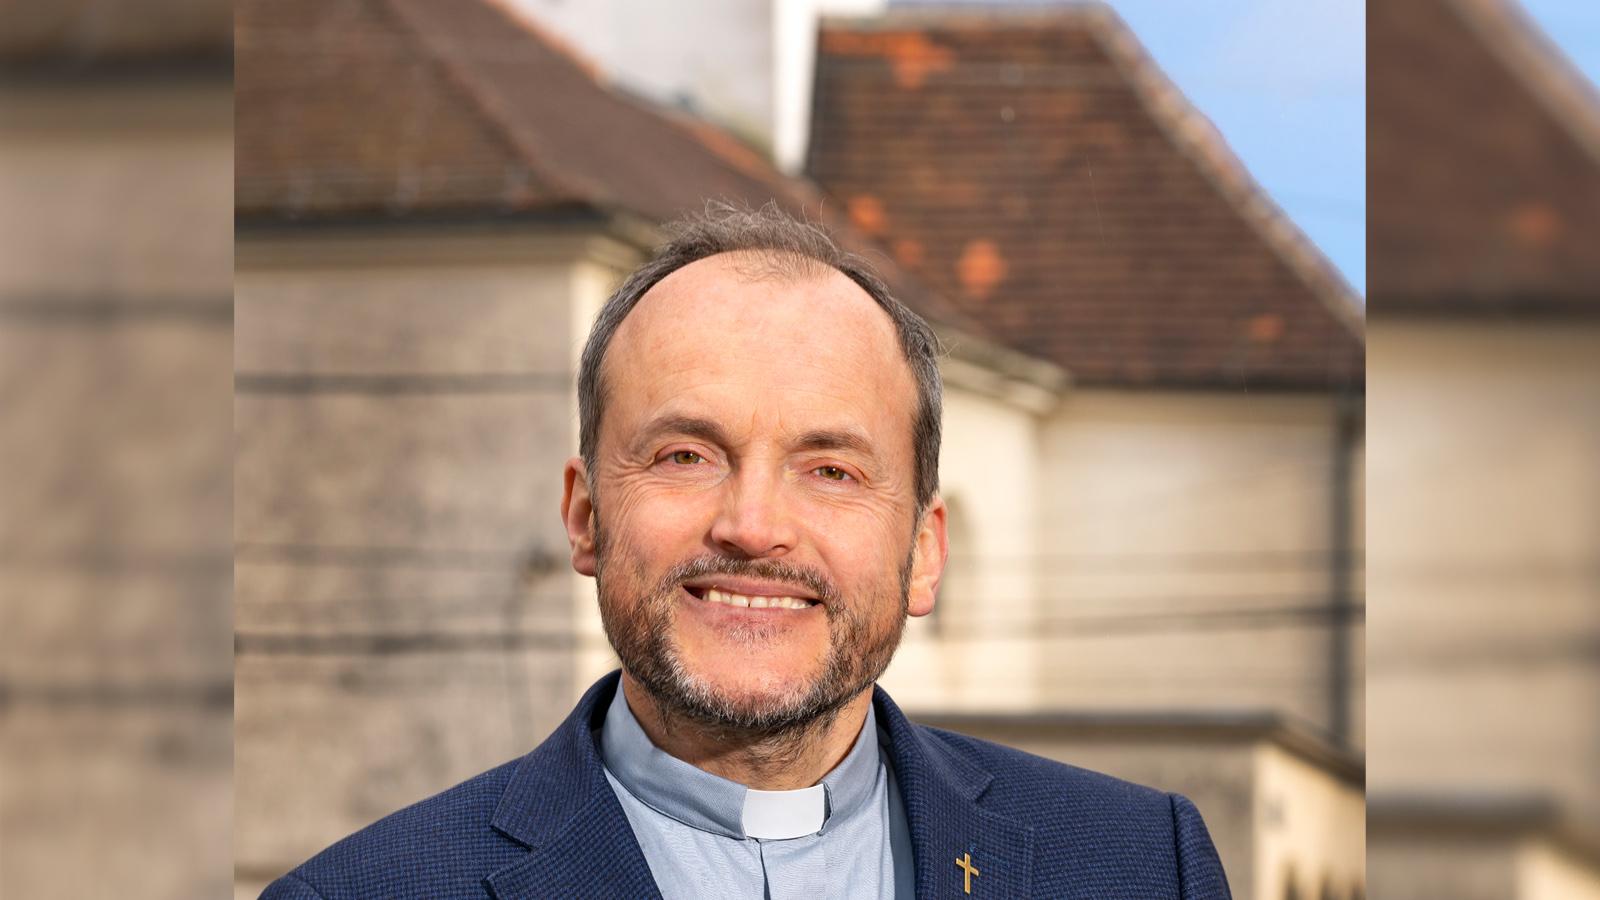 Harald Mally – der Pfarrer | story.one